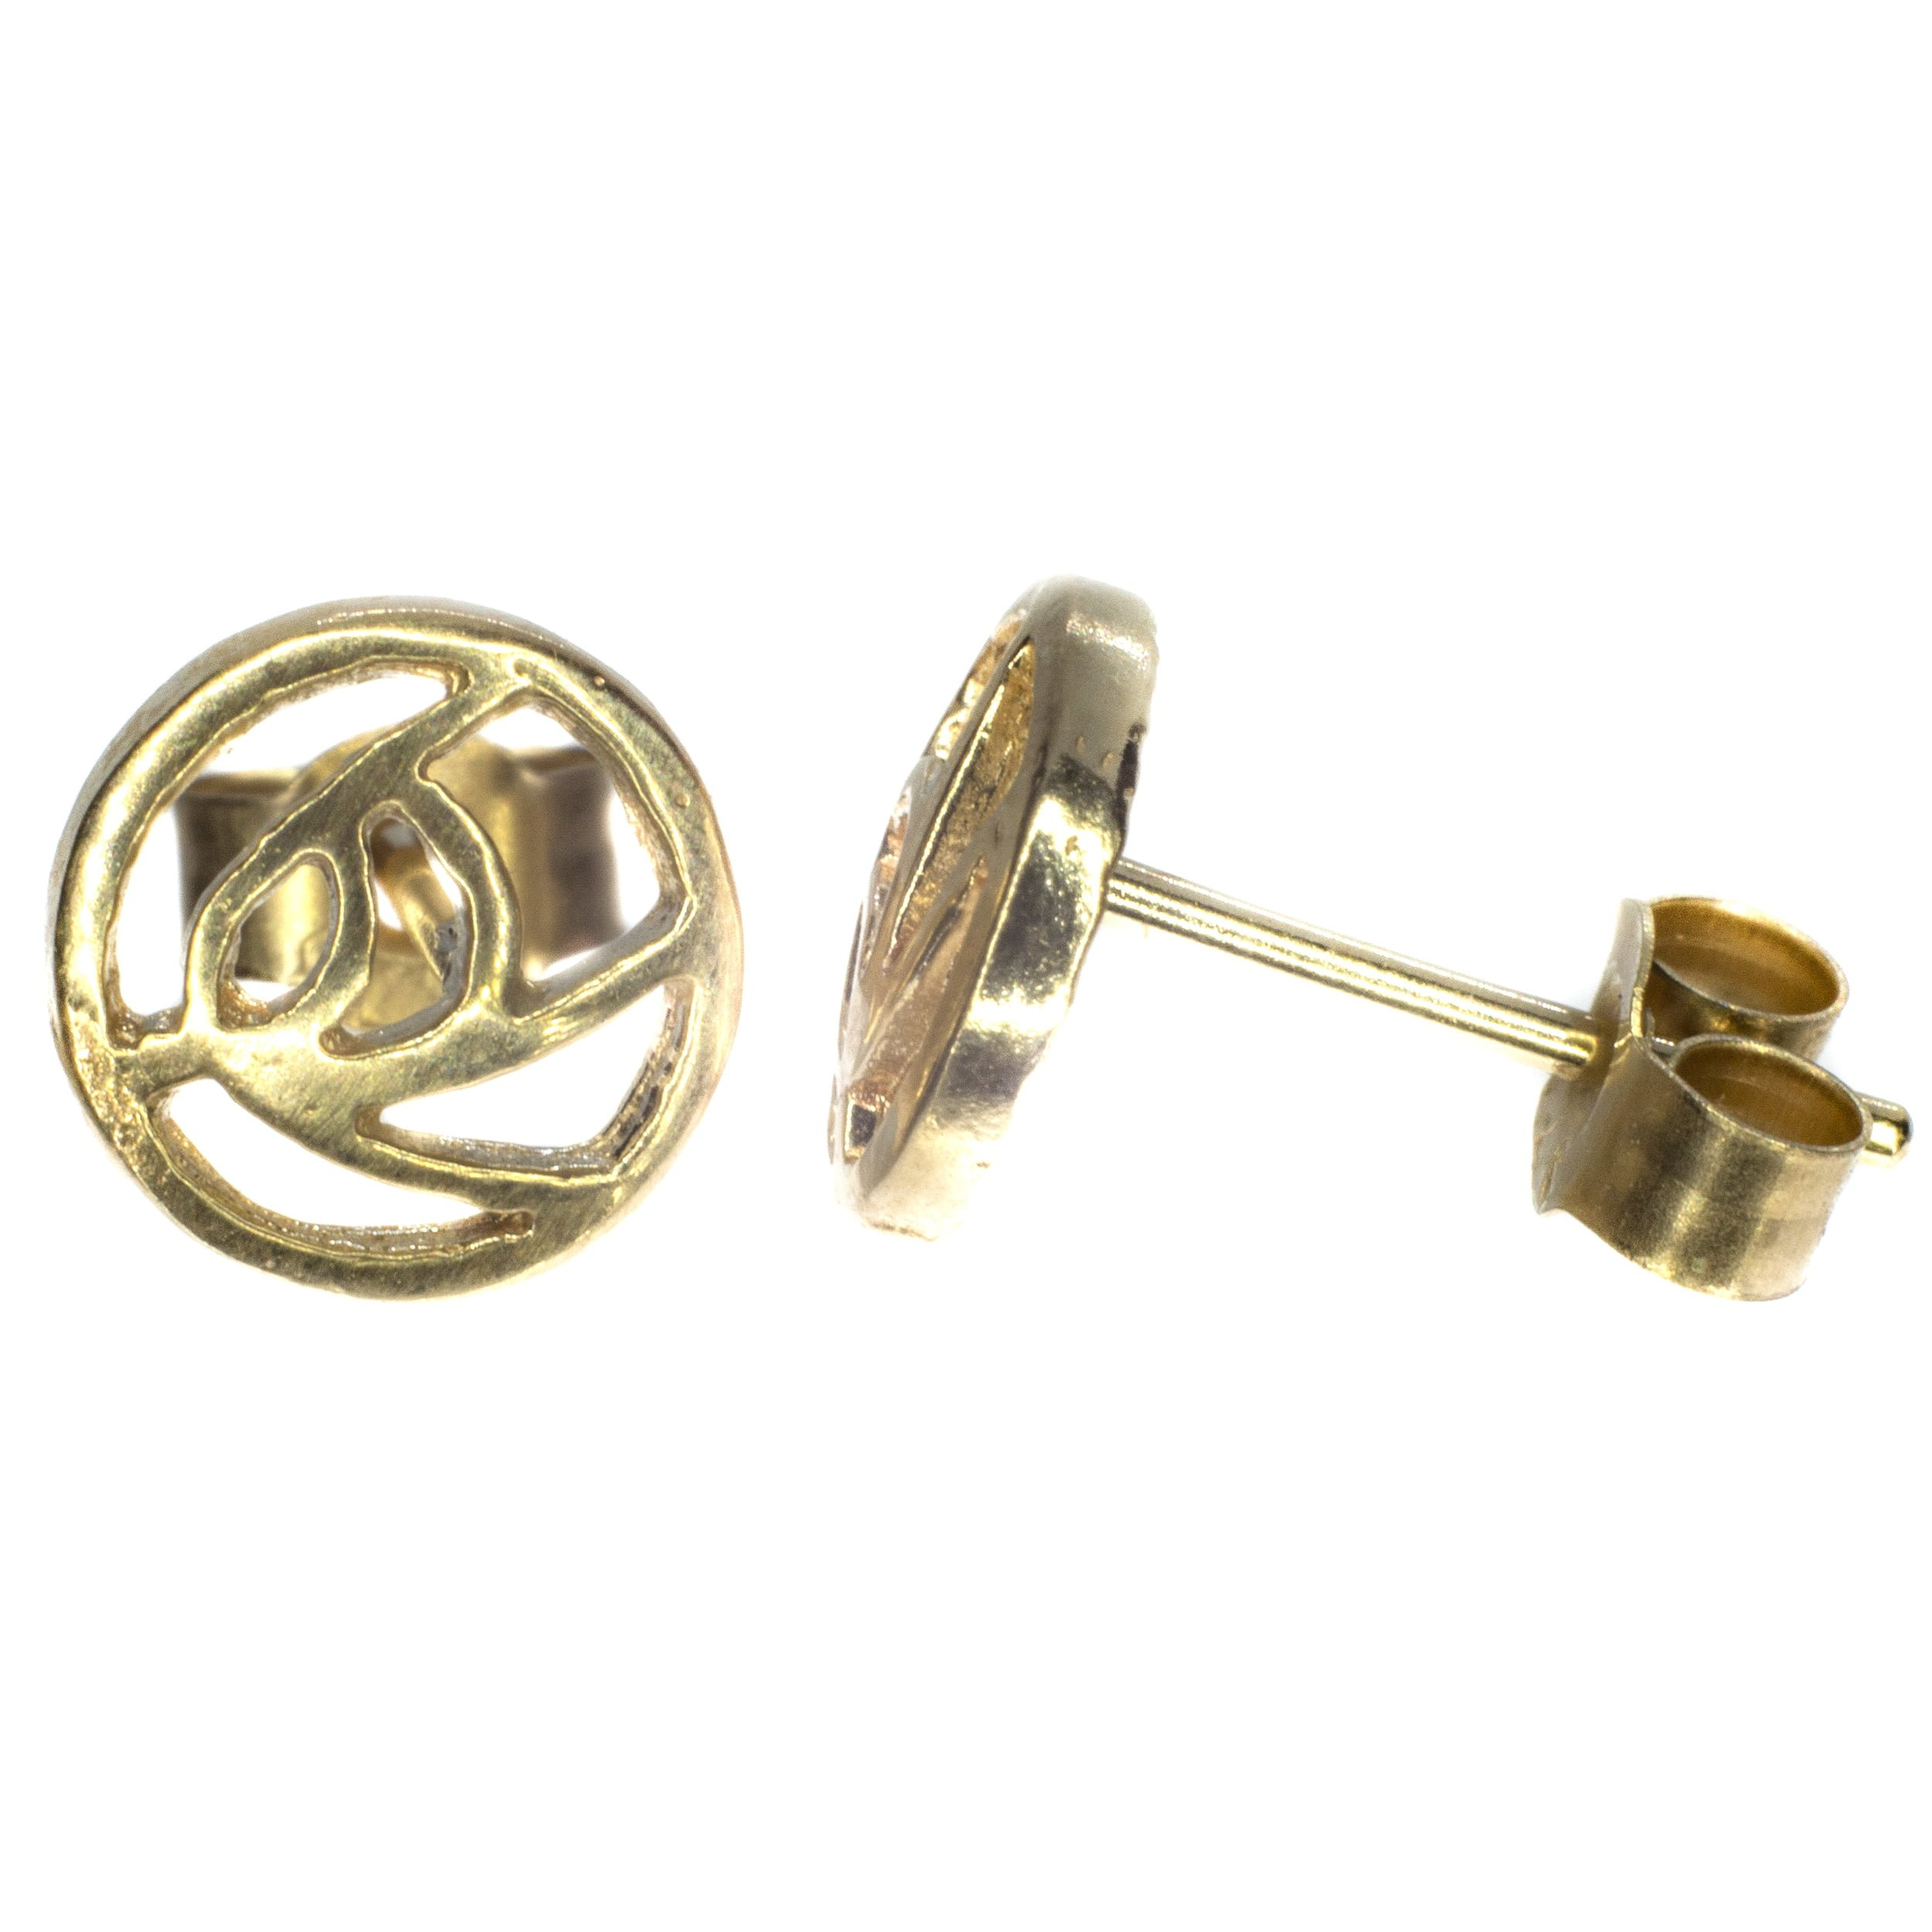 6mm Rennie Mackintosh gold stud earing 9ct yellow gold alt 3